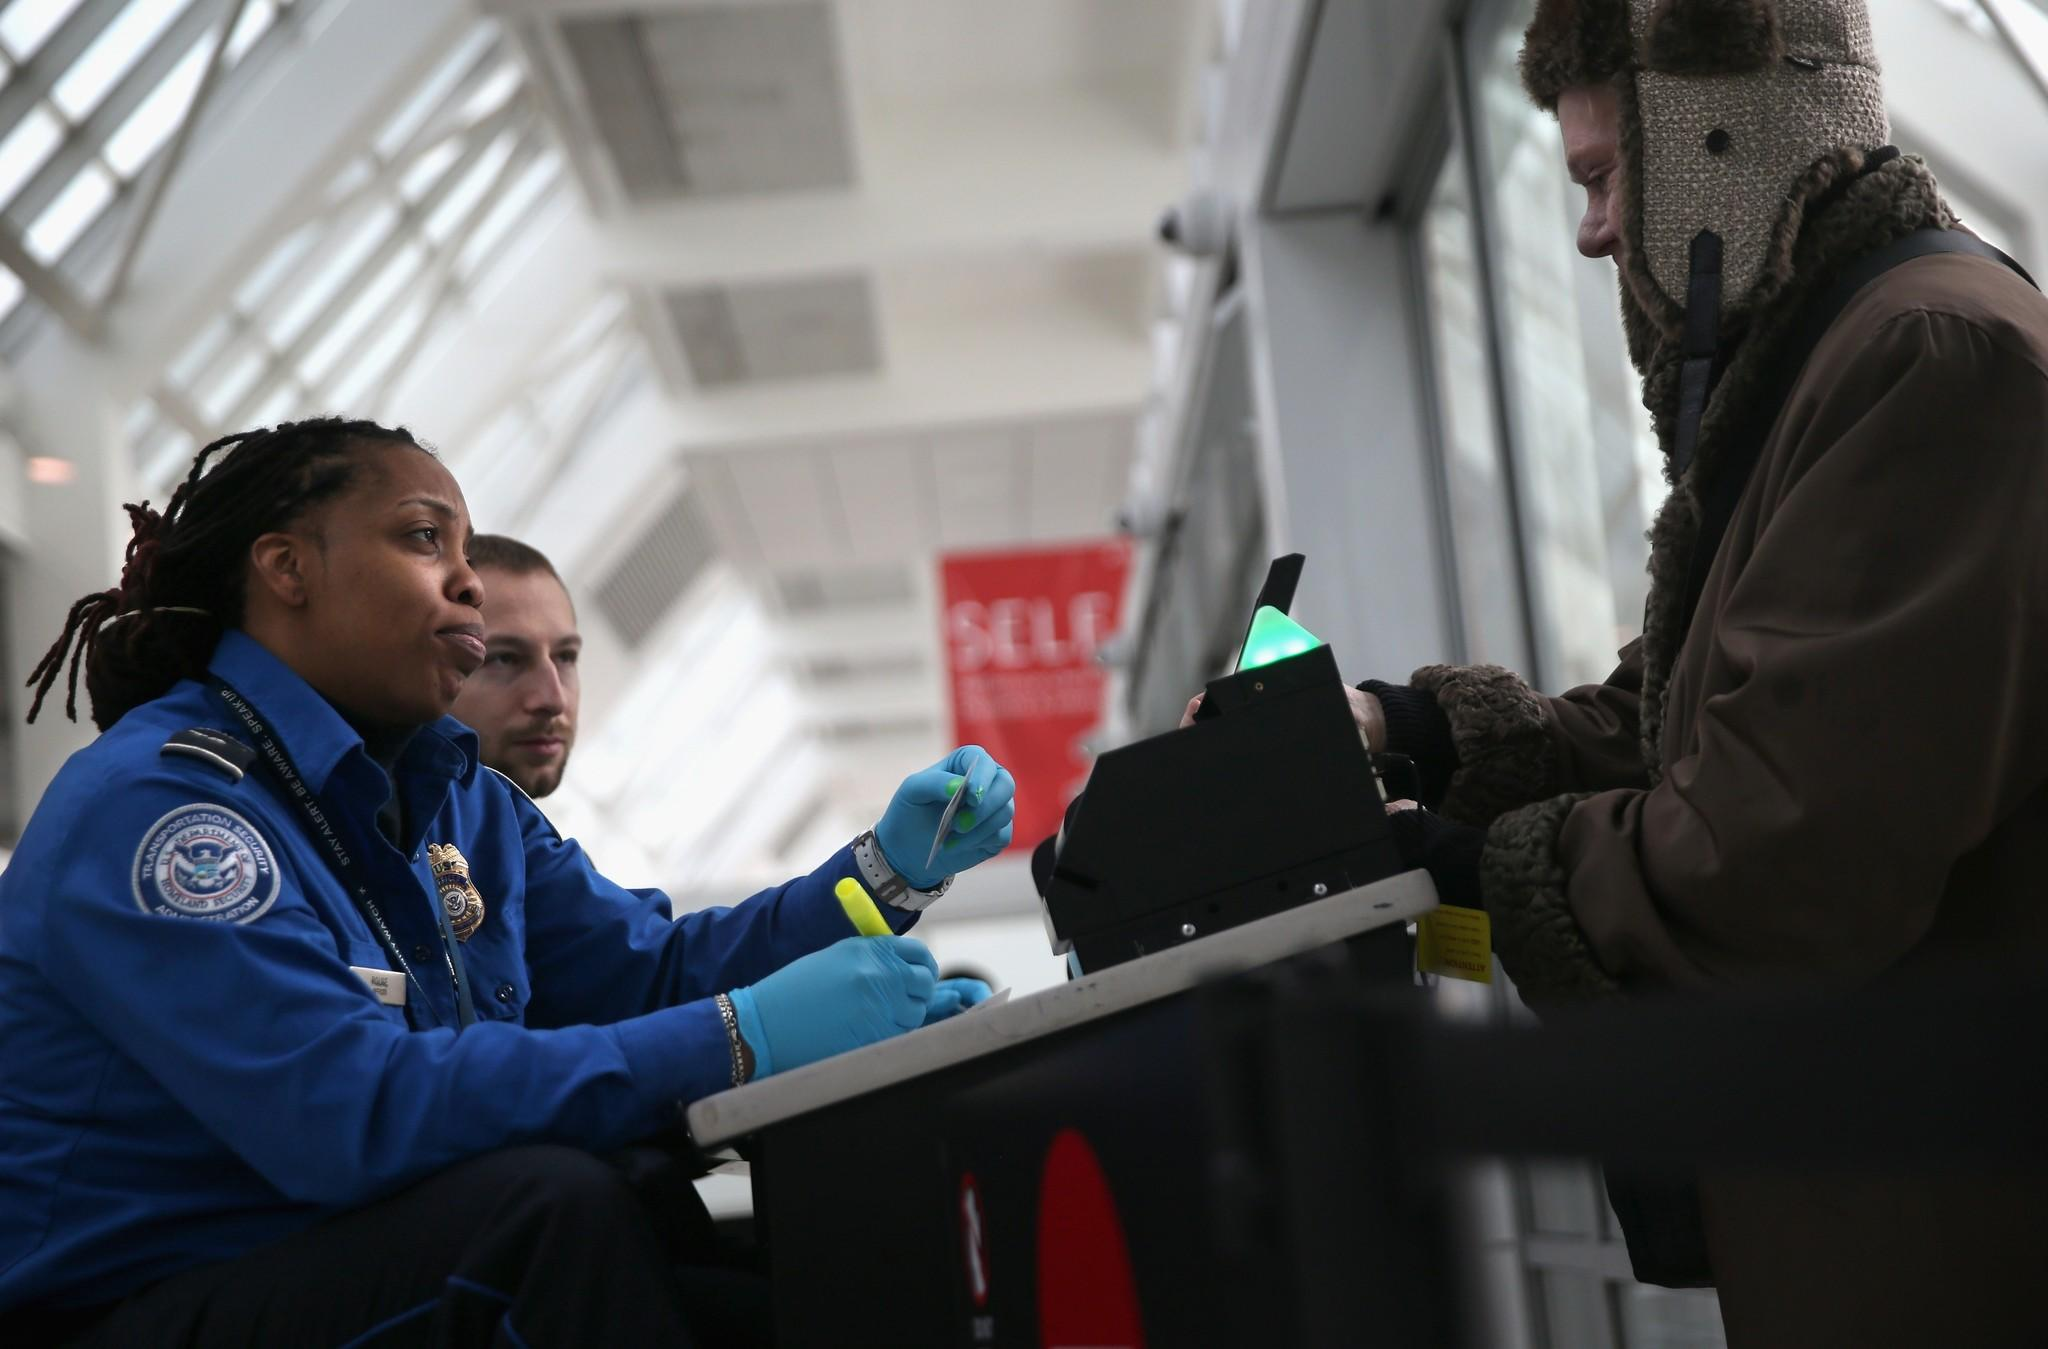 A TSA agent checks a traveler's identification at a special TSA Pre-check lane LaGuardia Airport in New York